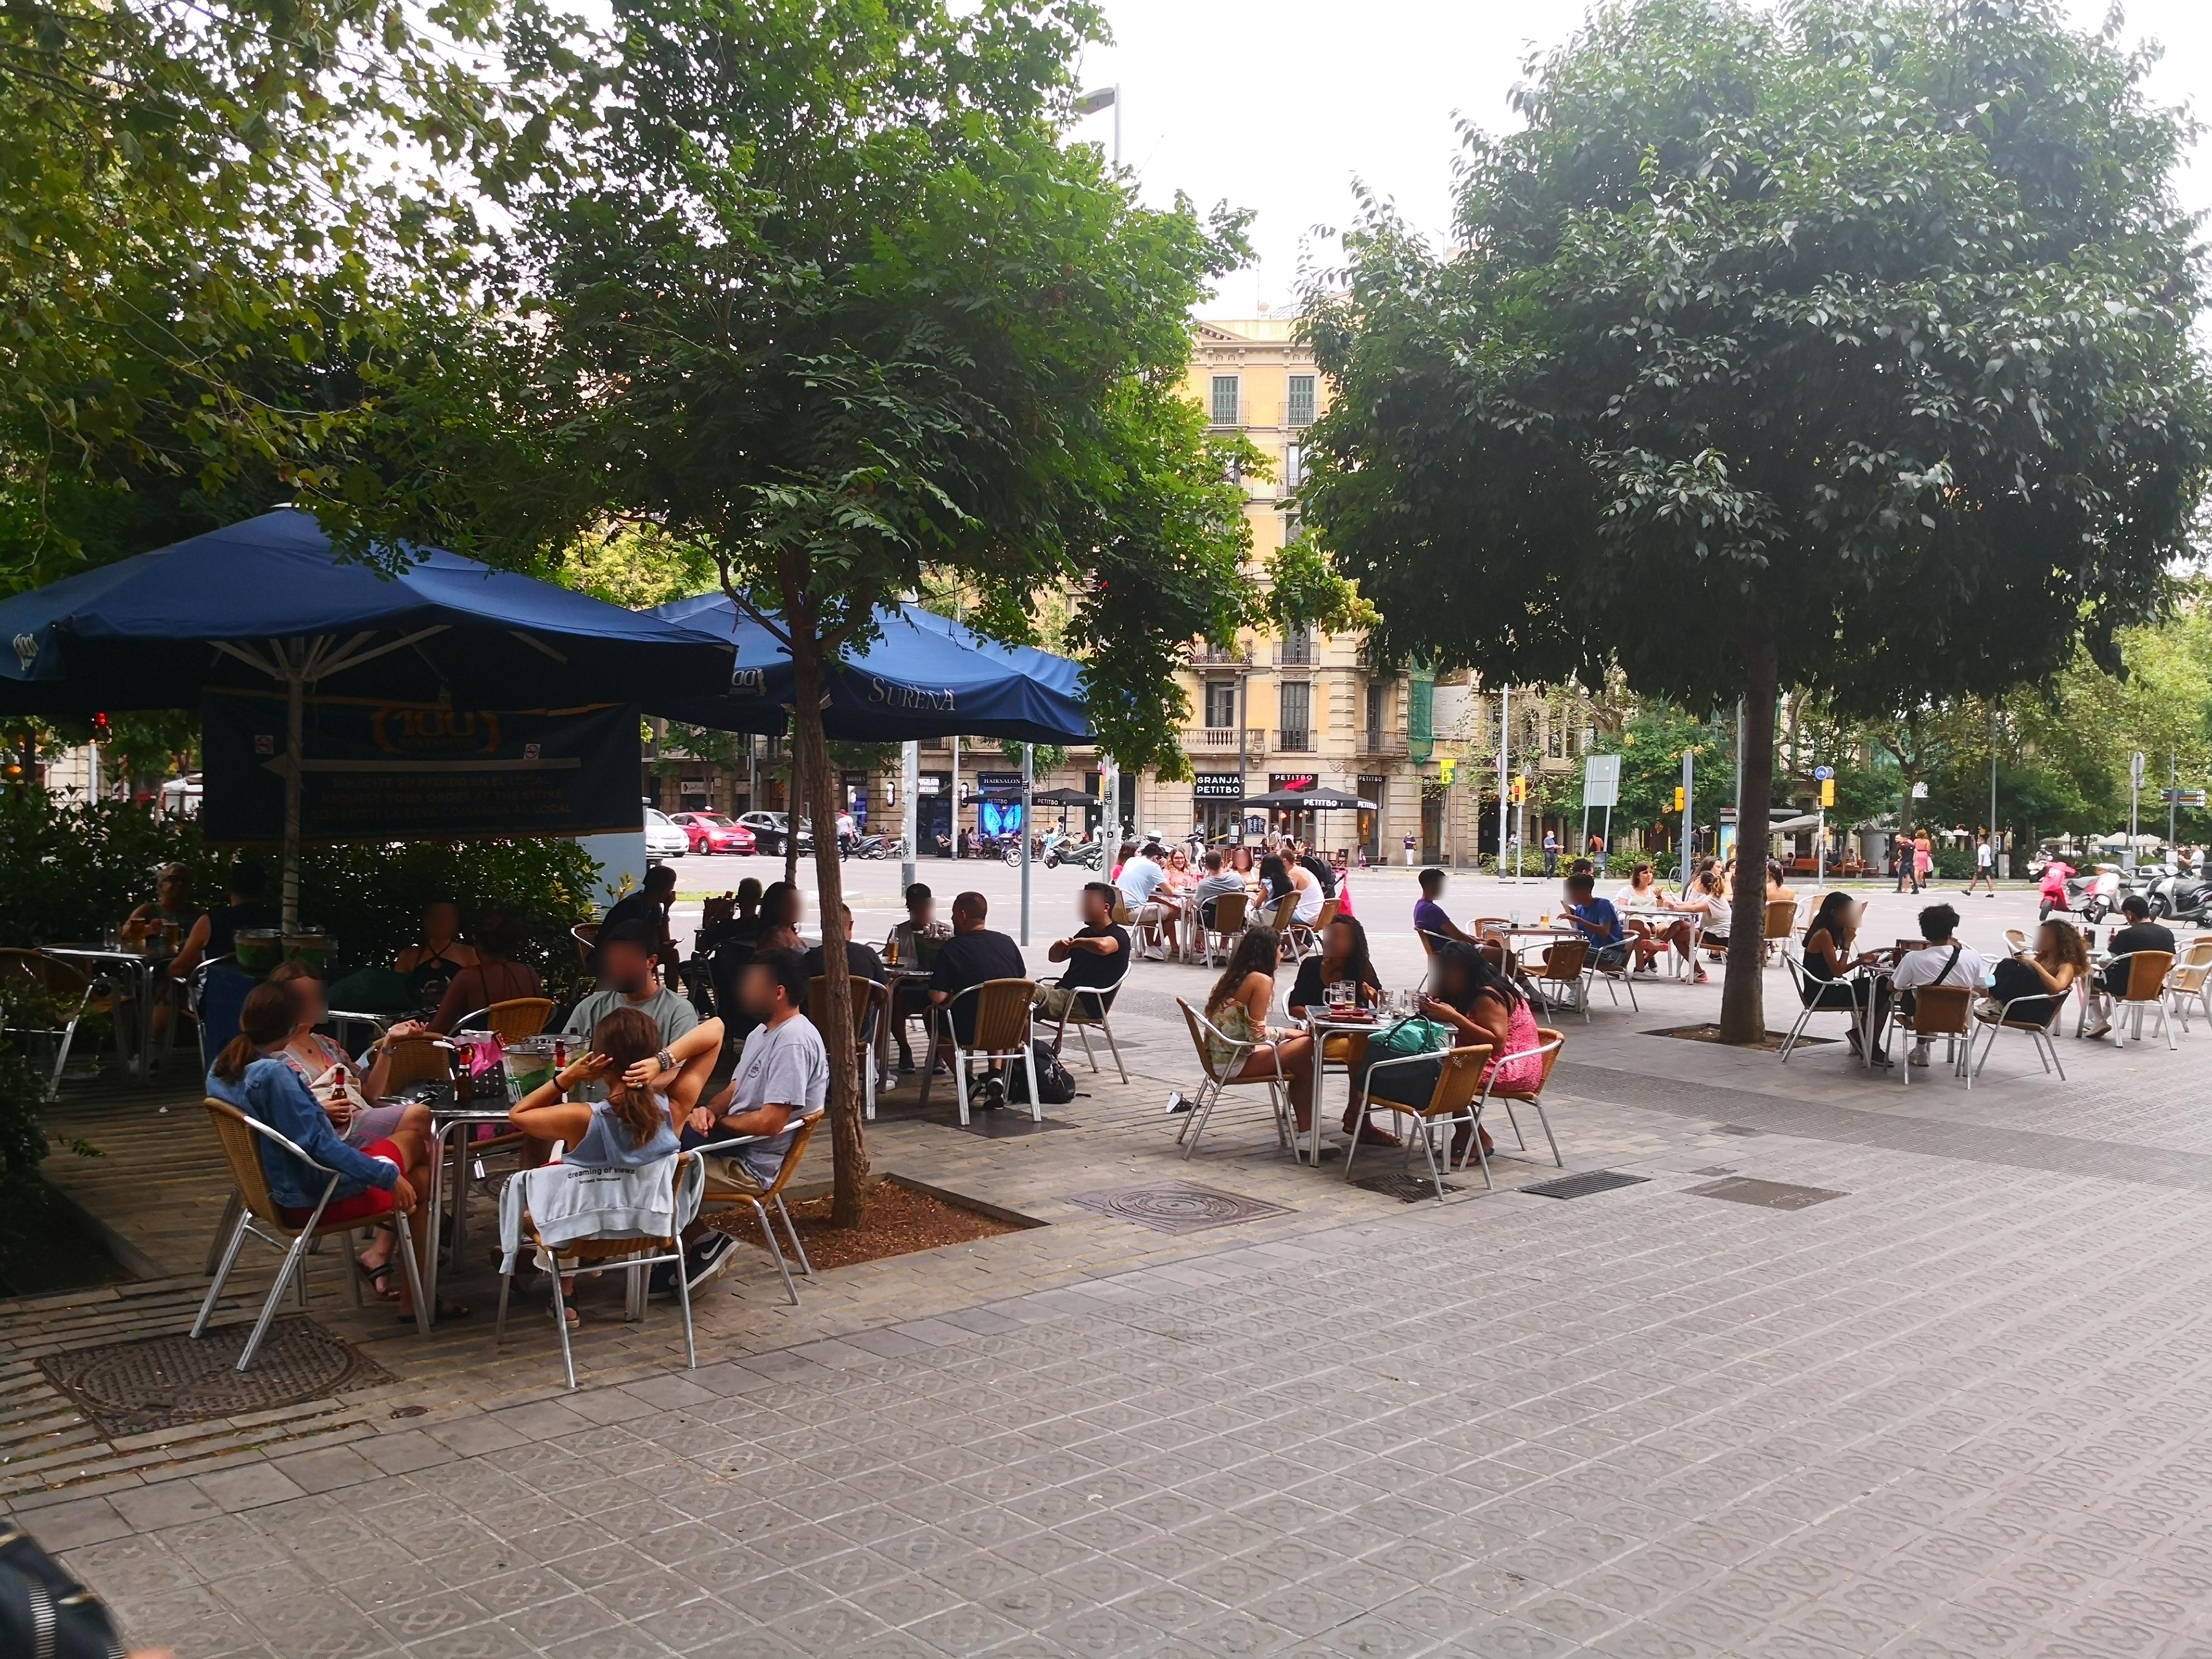 Passeig de Sant Joan, 77 - Ole, Olé, Olé... fagocitant espai públic!!!